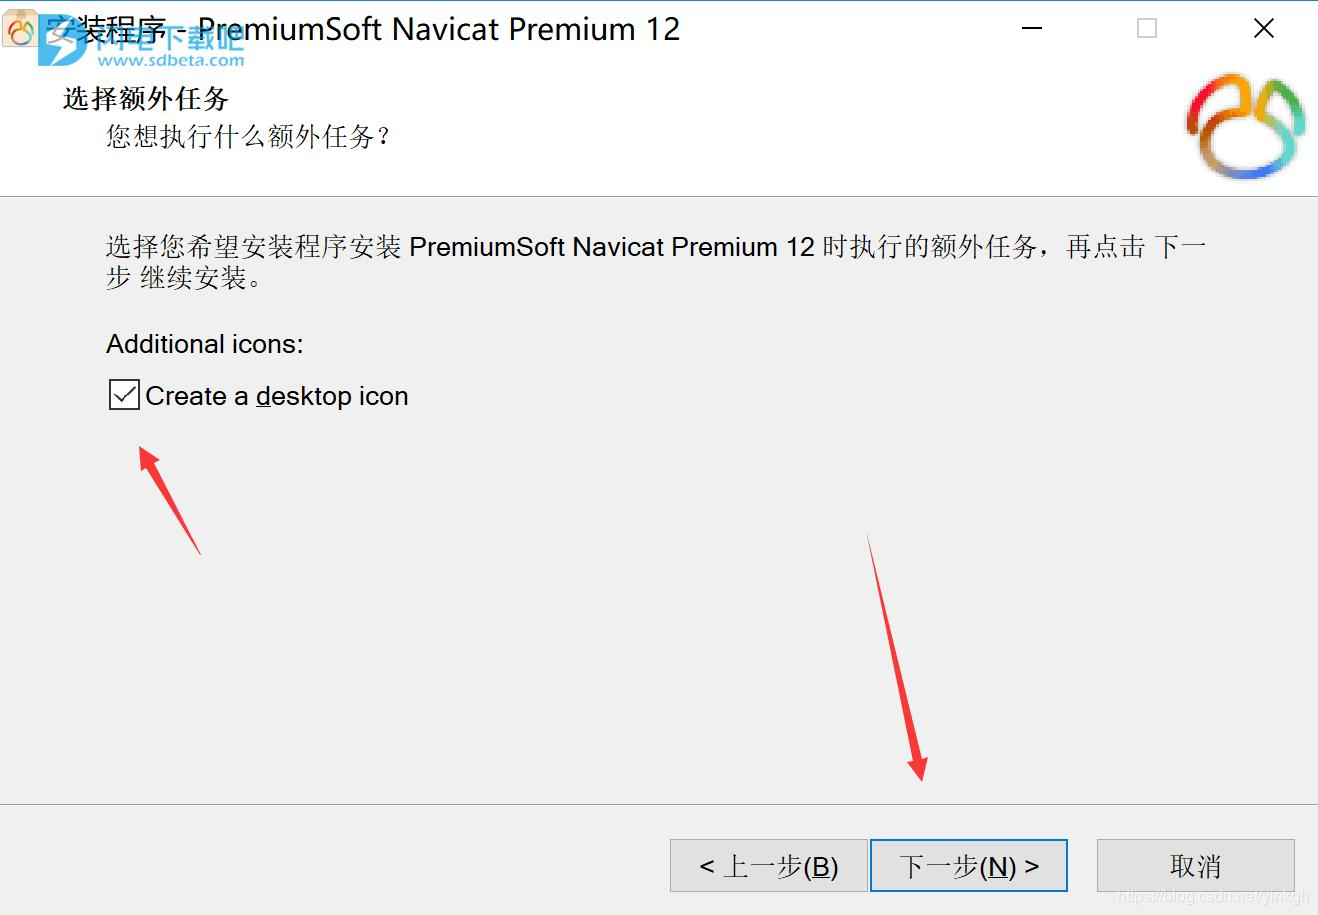 navicat premium 12.0.22 crack